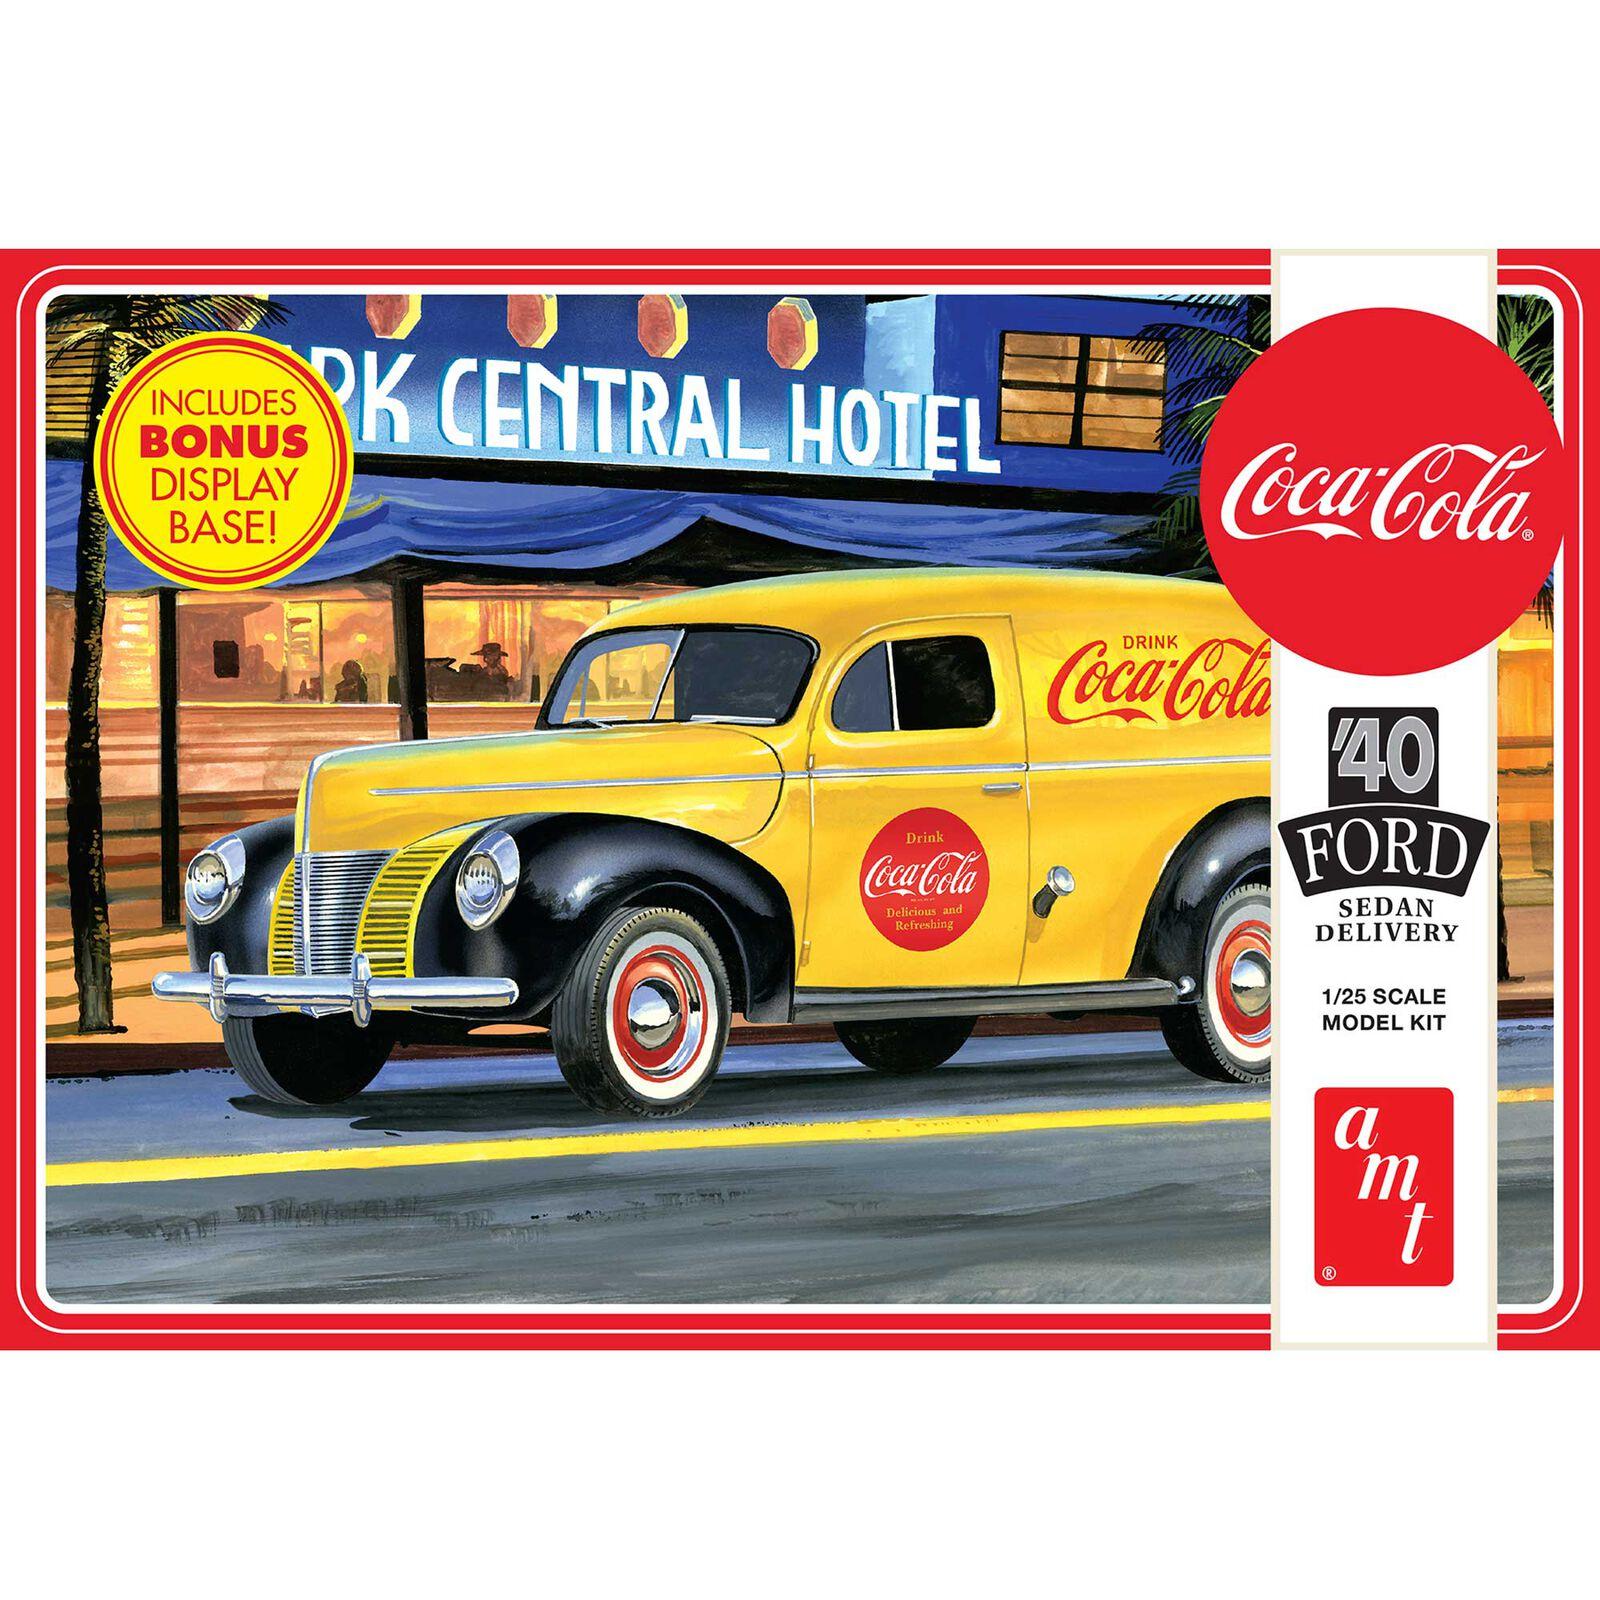 1/25 1940 Ford Sedan Delivery Coca-Cola